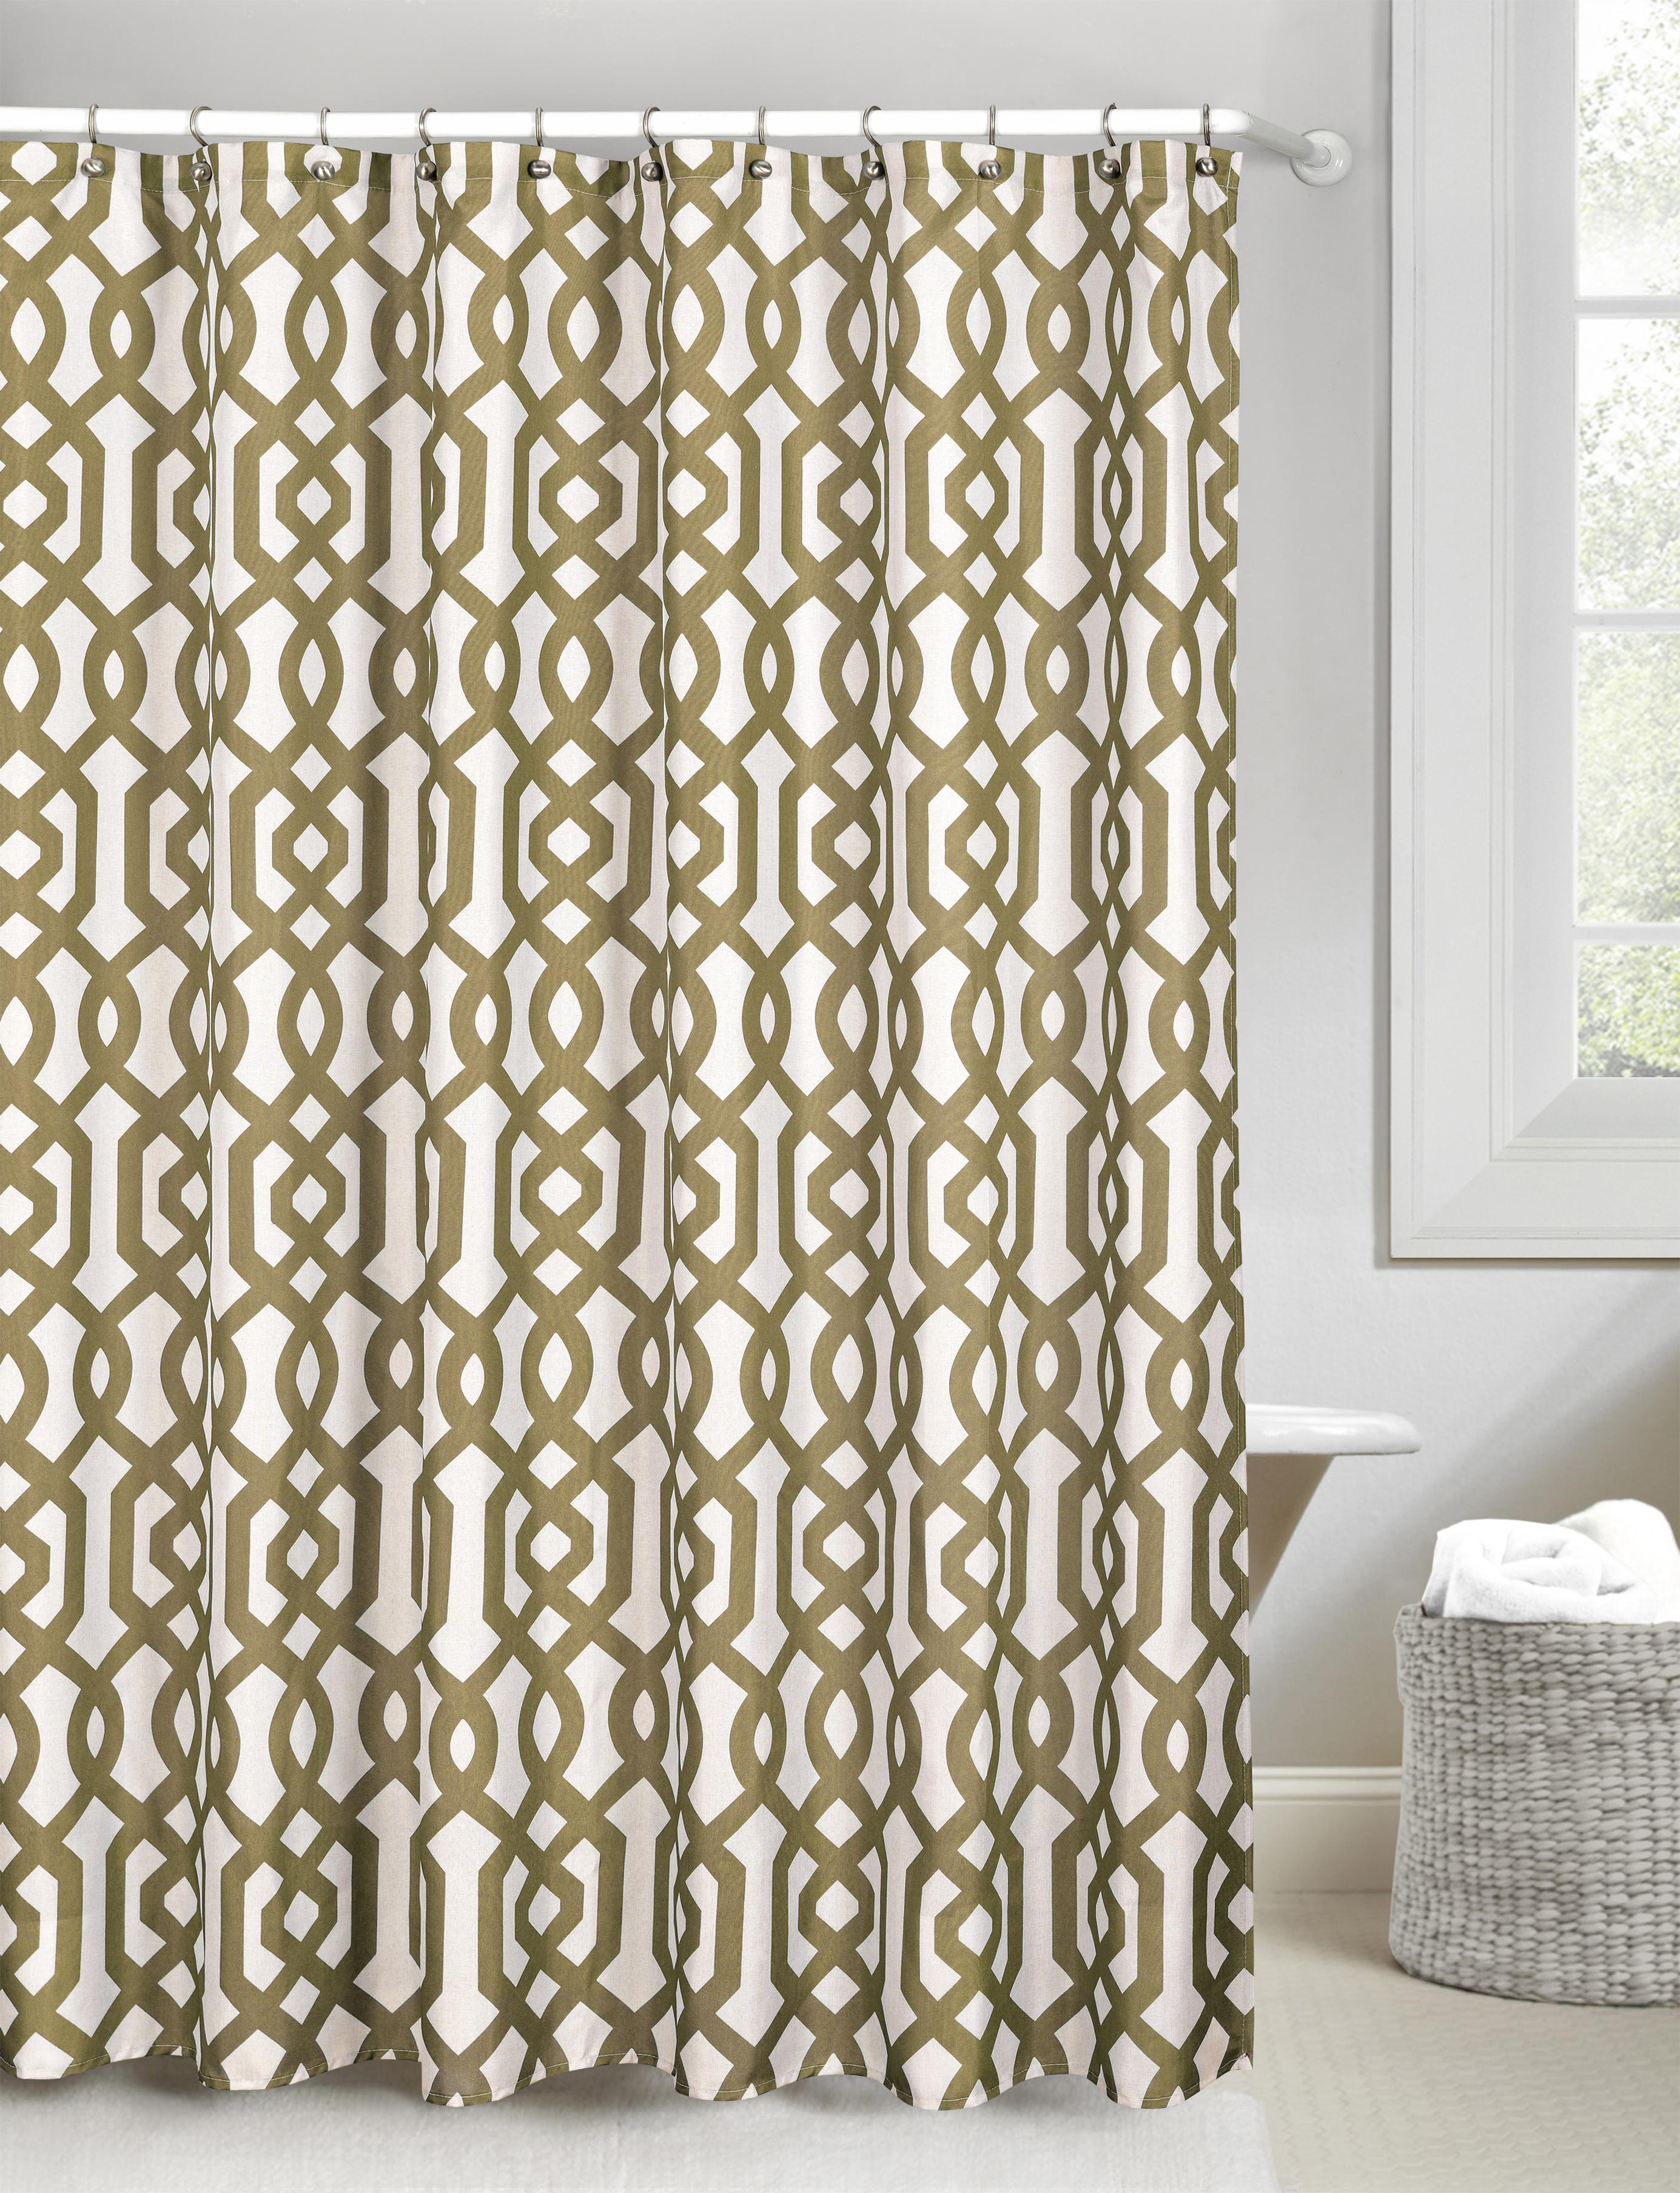 Ashmont Canvas Shower Curtain Set - Tanga